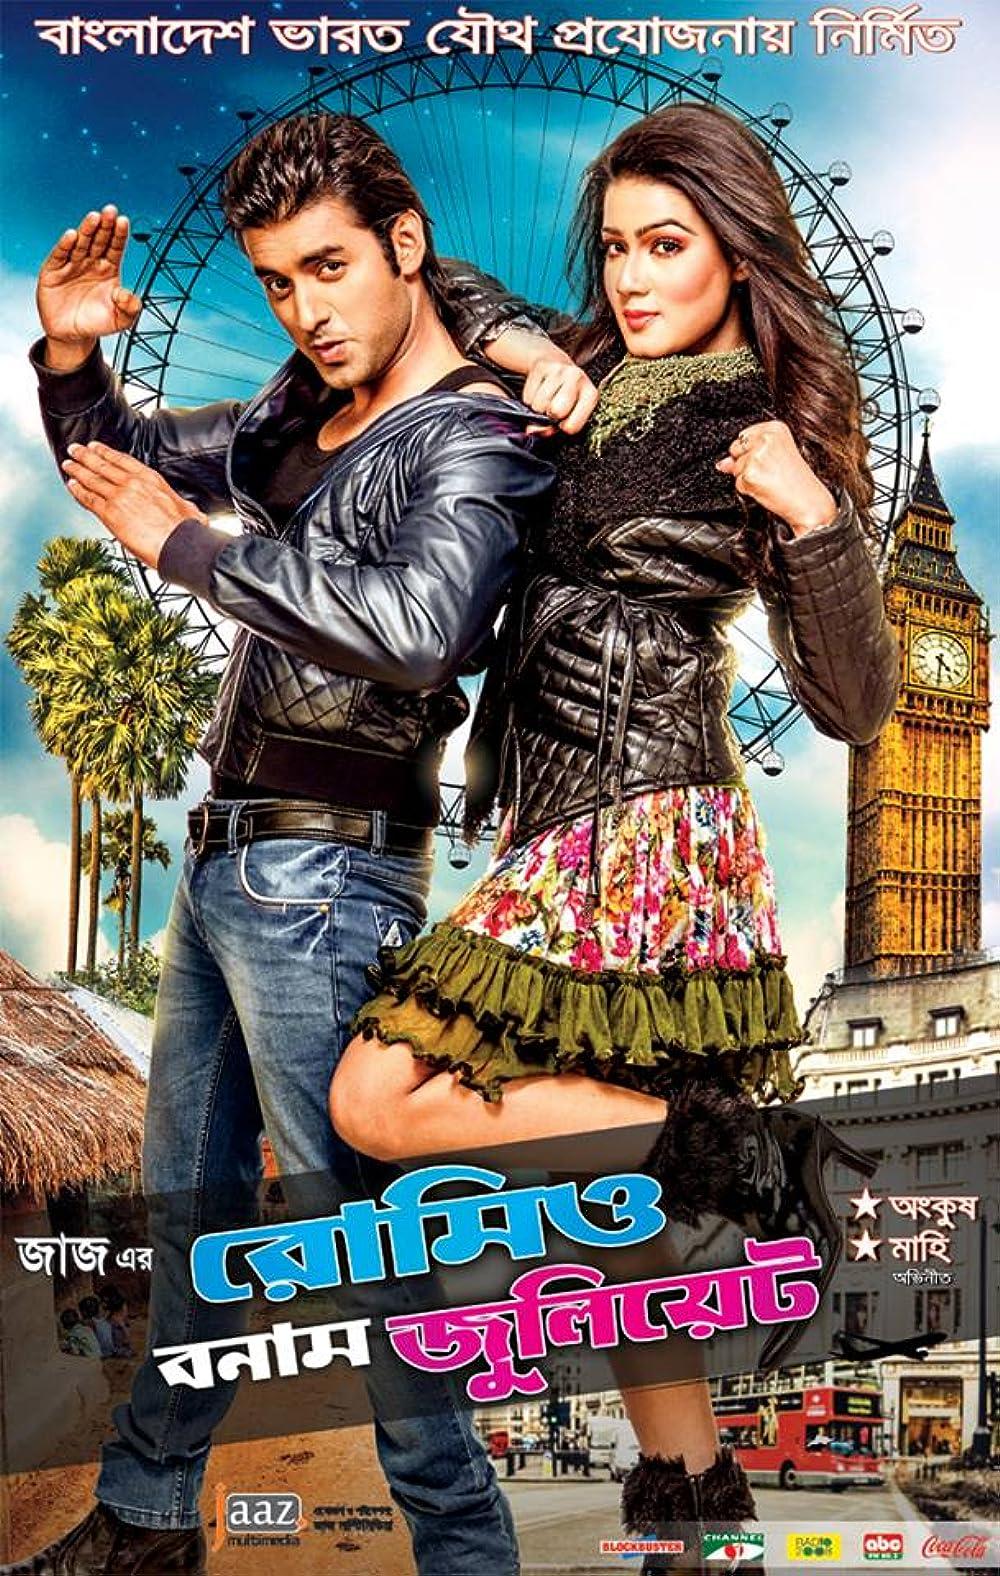 Romeo Vs Juliet 2021 Bangla Full Movie 720p Amzn HDRip ESubs 800MB x264 AAC